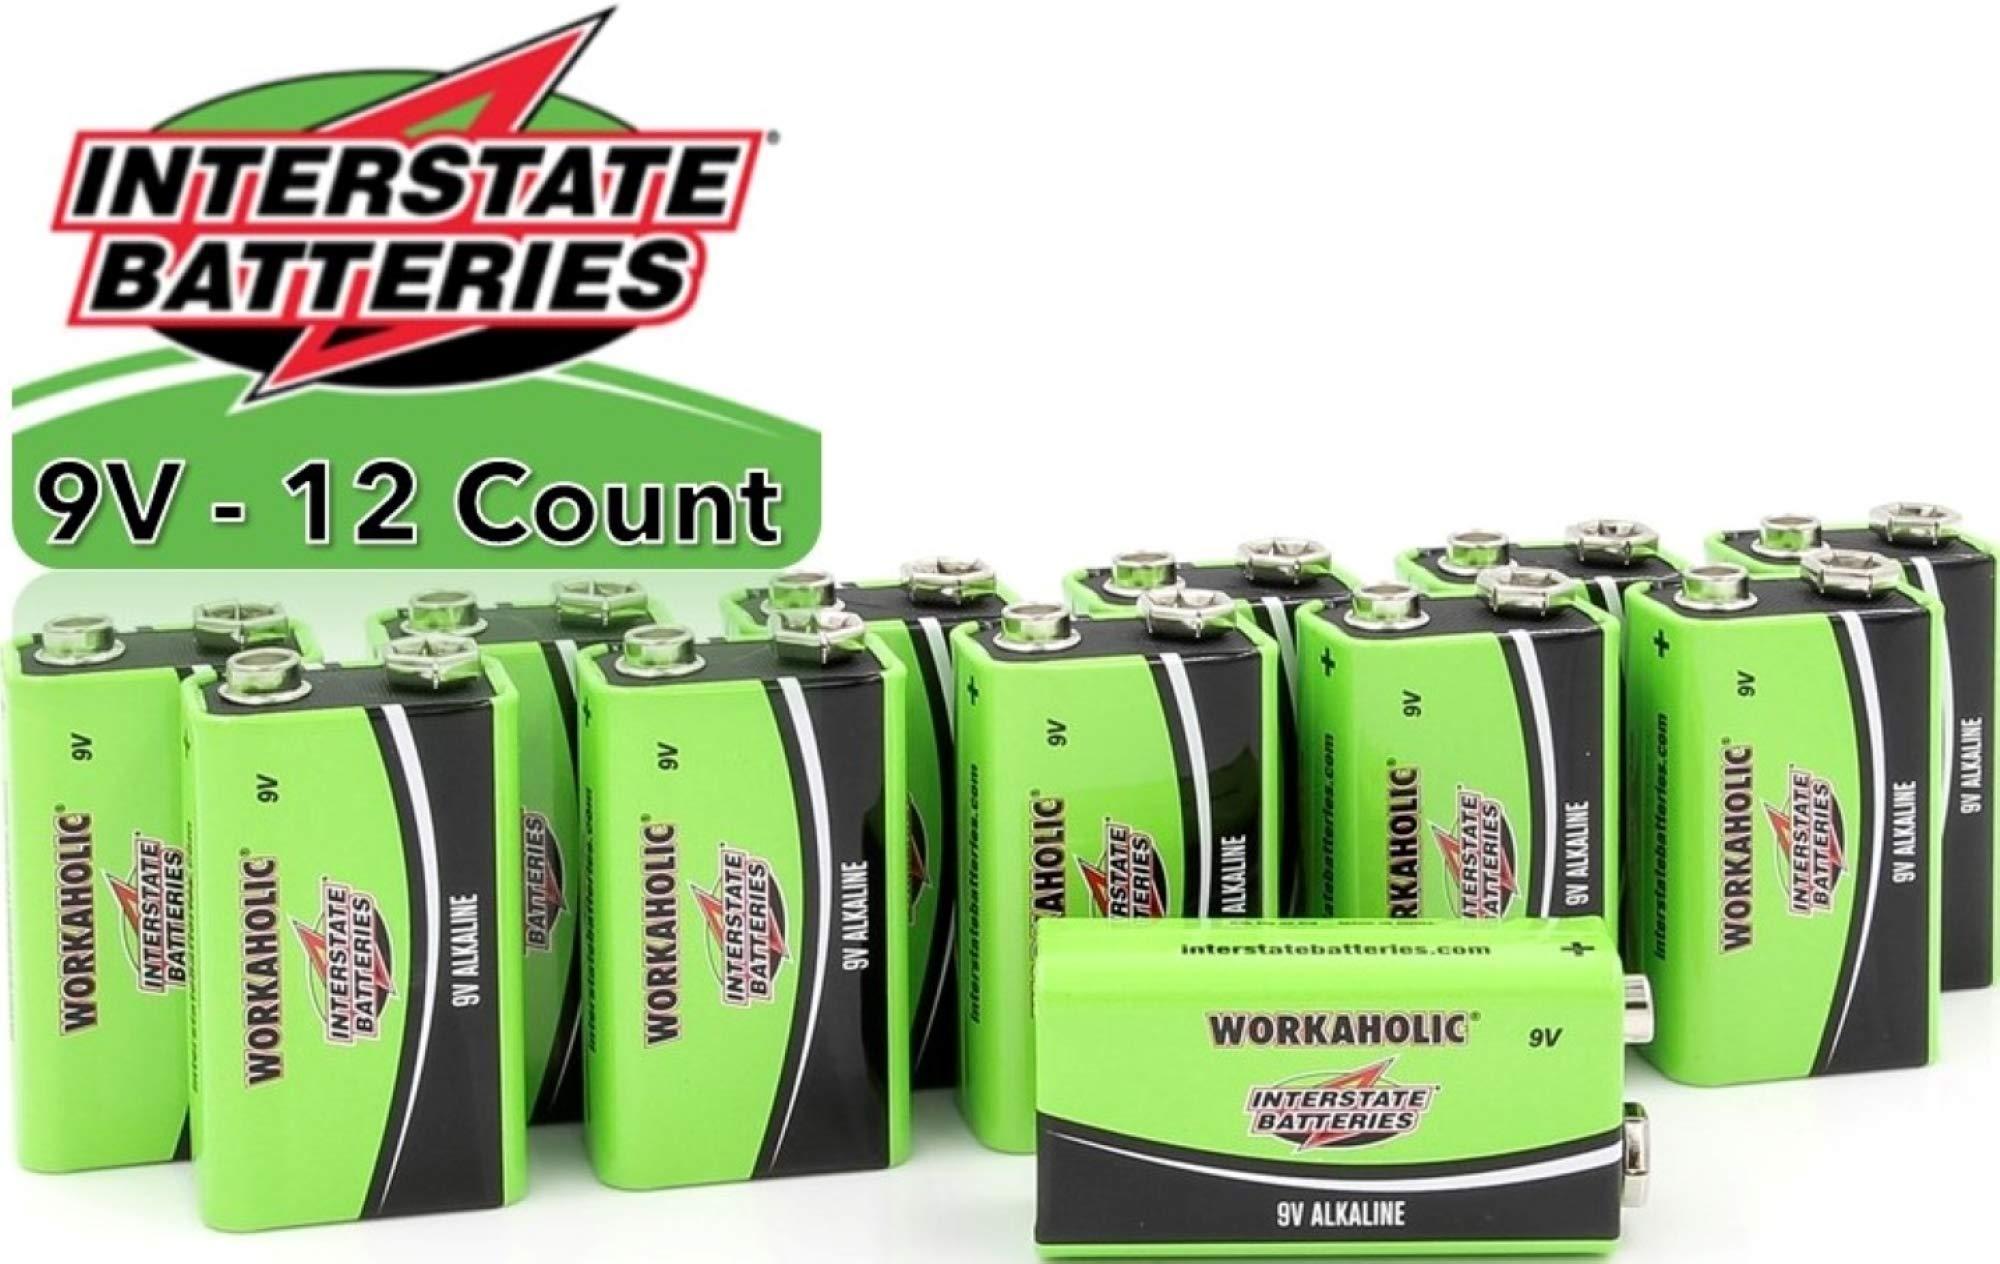 Interstate Batteries 9 Volt All-Purpose Alkaline Battery 12 Pack - Workaholic (DRY0196)